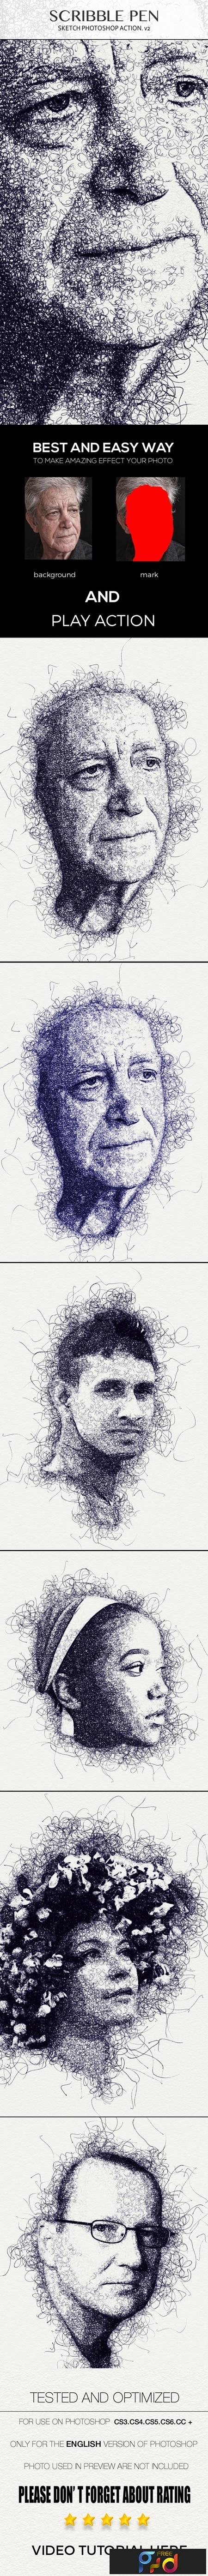 Scribble Pen Sketch Photoshop Action v2 23702601 1